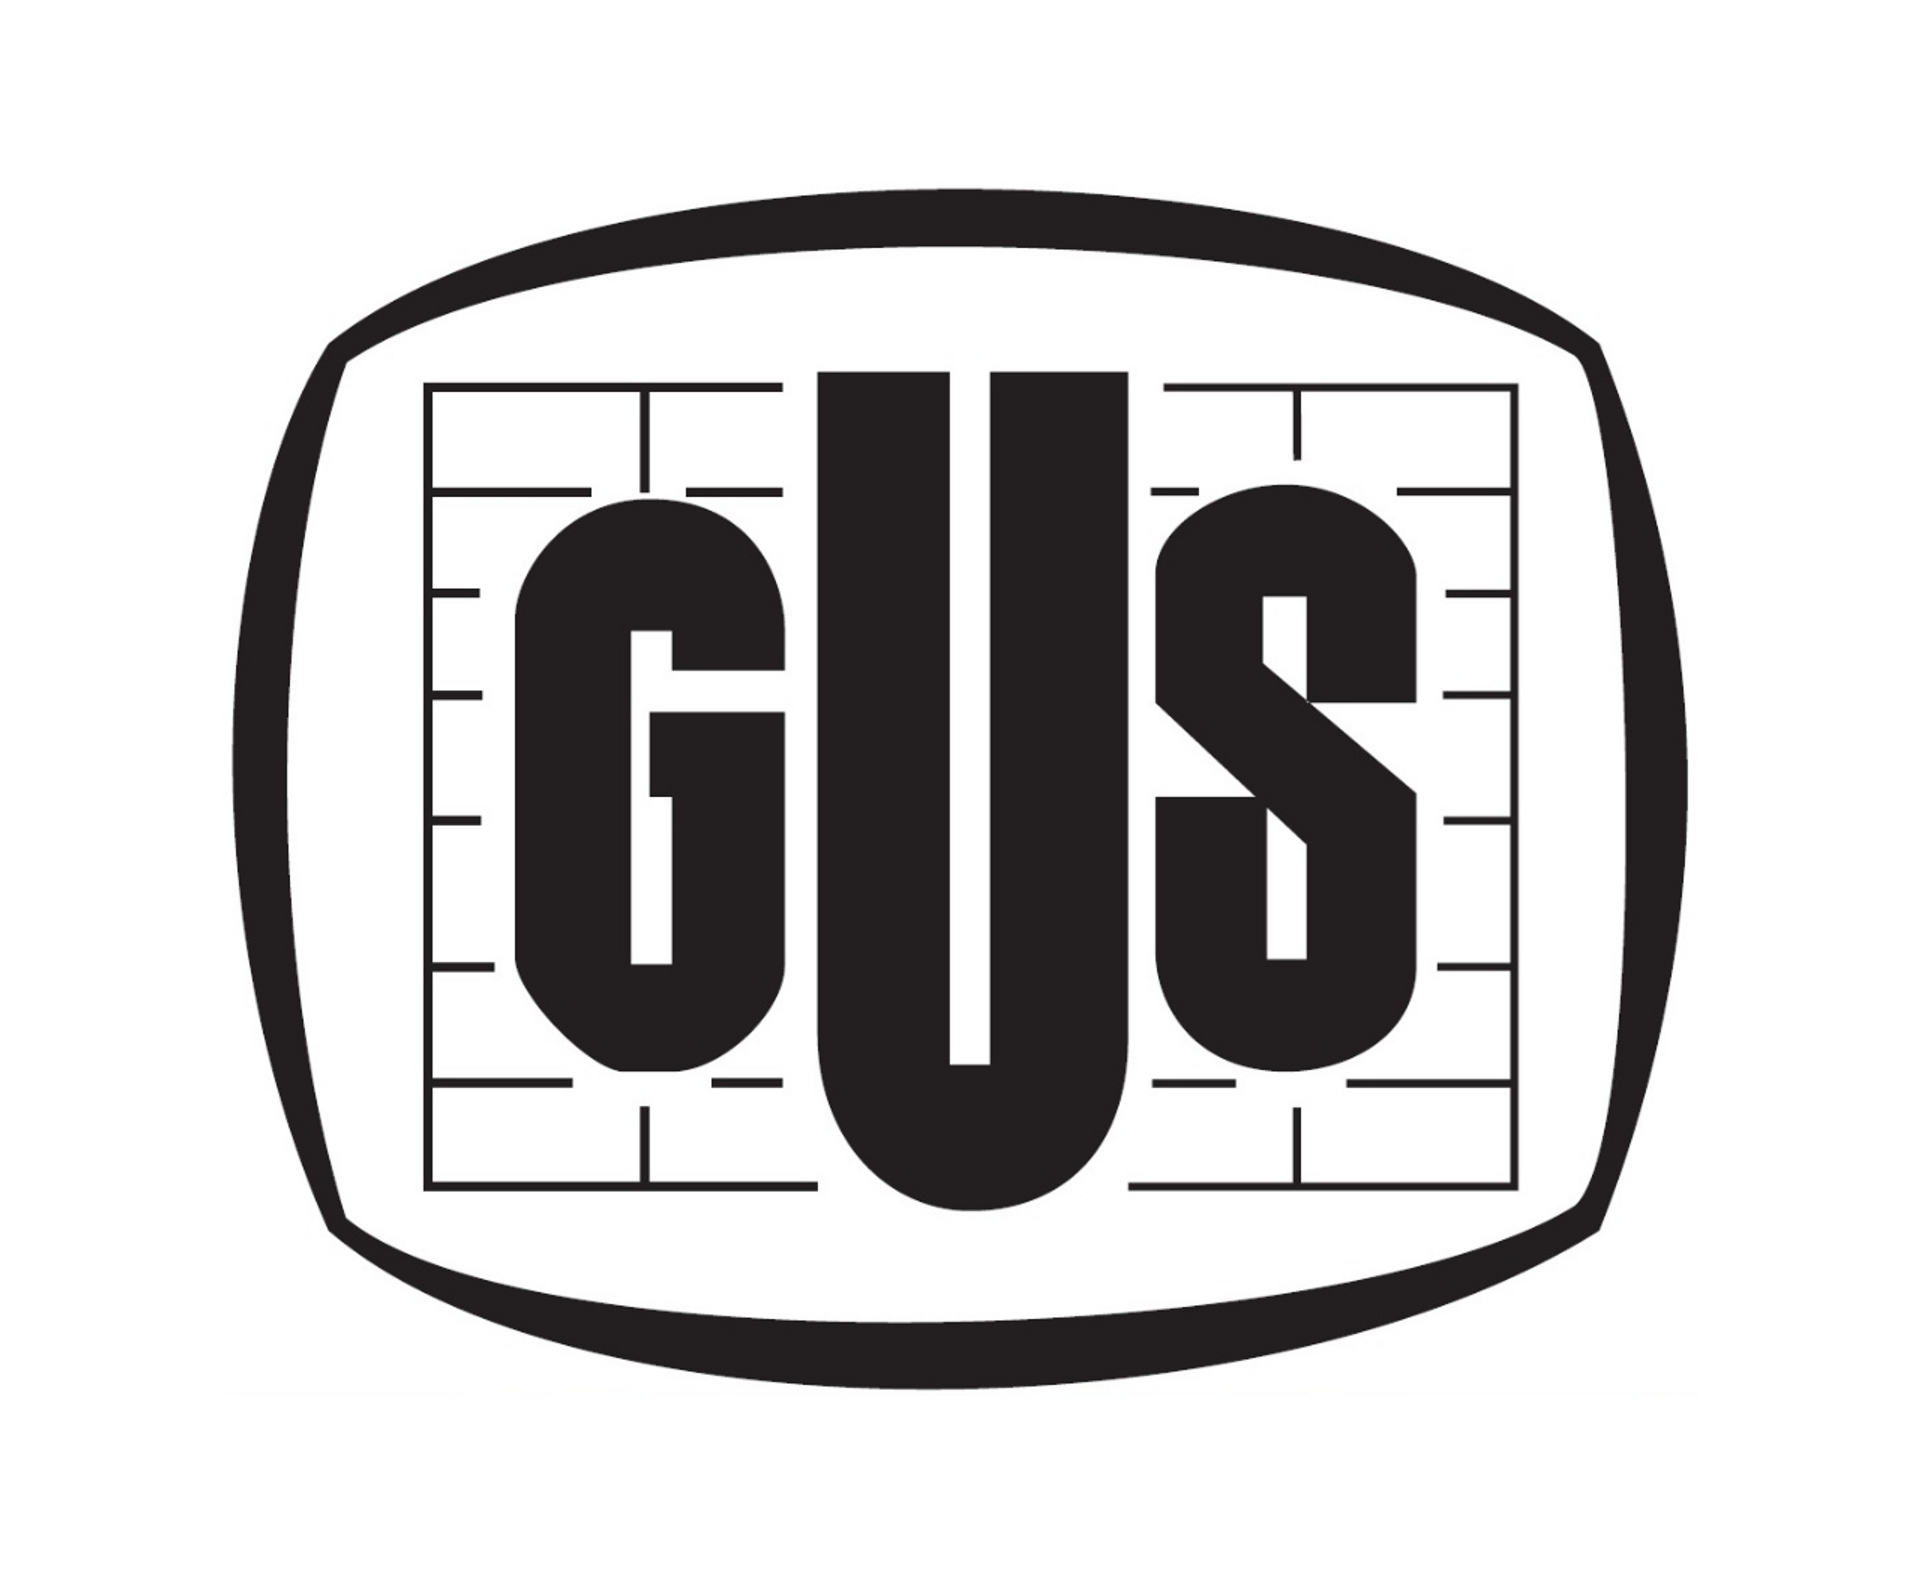 [Polska] Dobre wieści z GUS